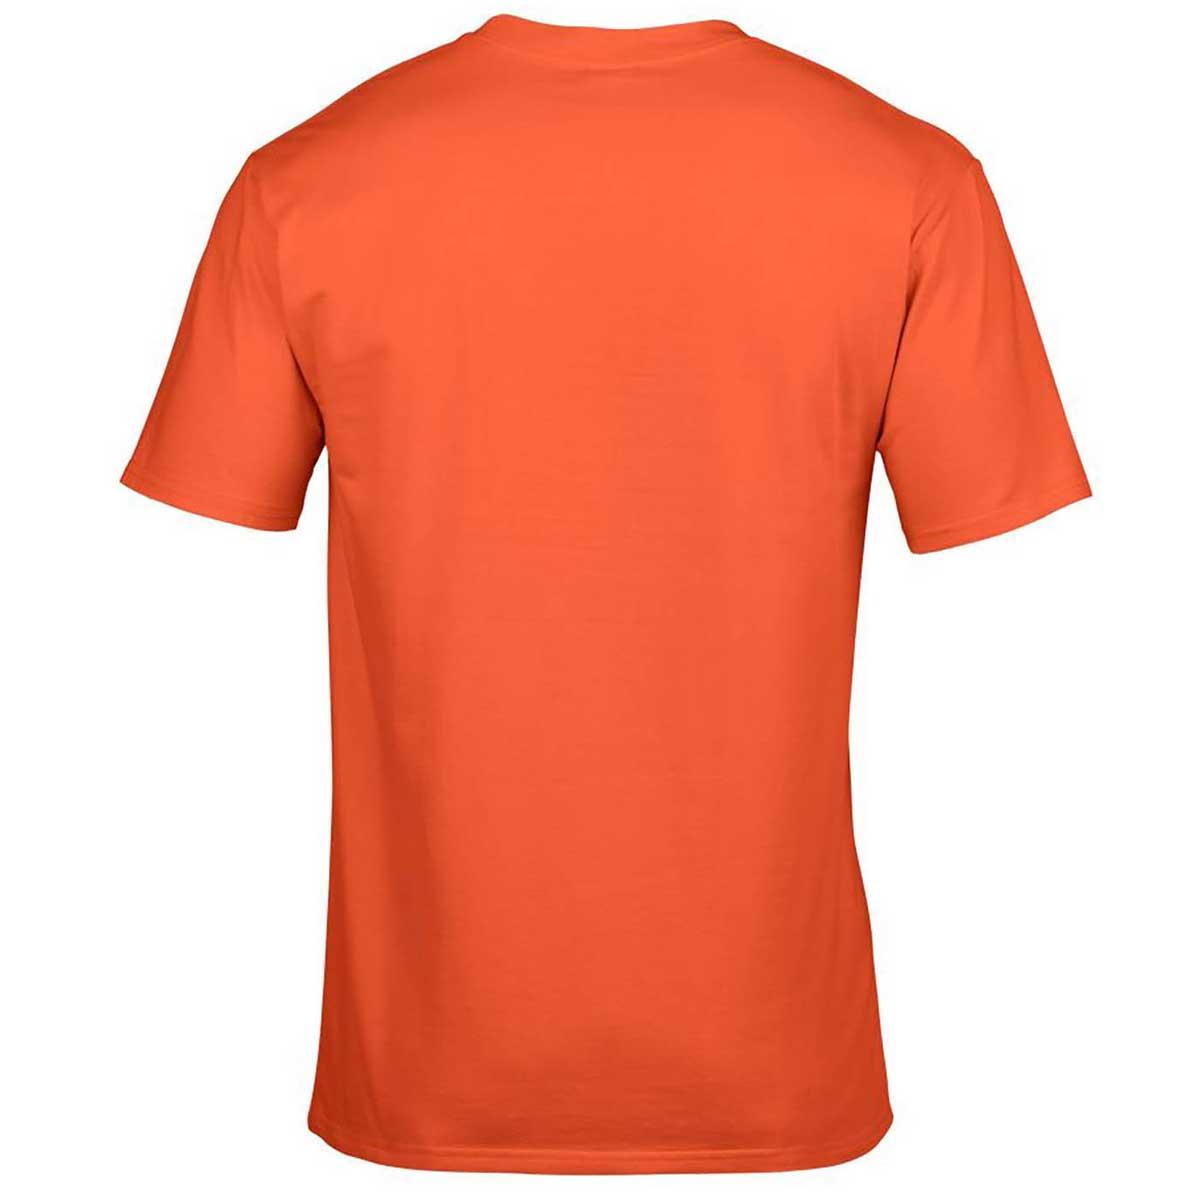 05_gd05b_orange--0-0--bde8a8d7-af39-4cd3-ad53-5a610db0b2c2